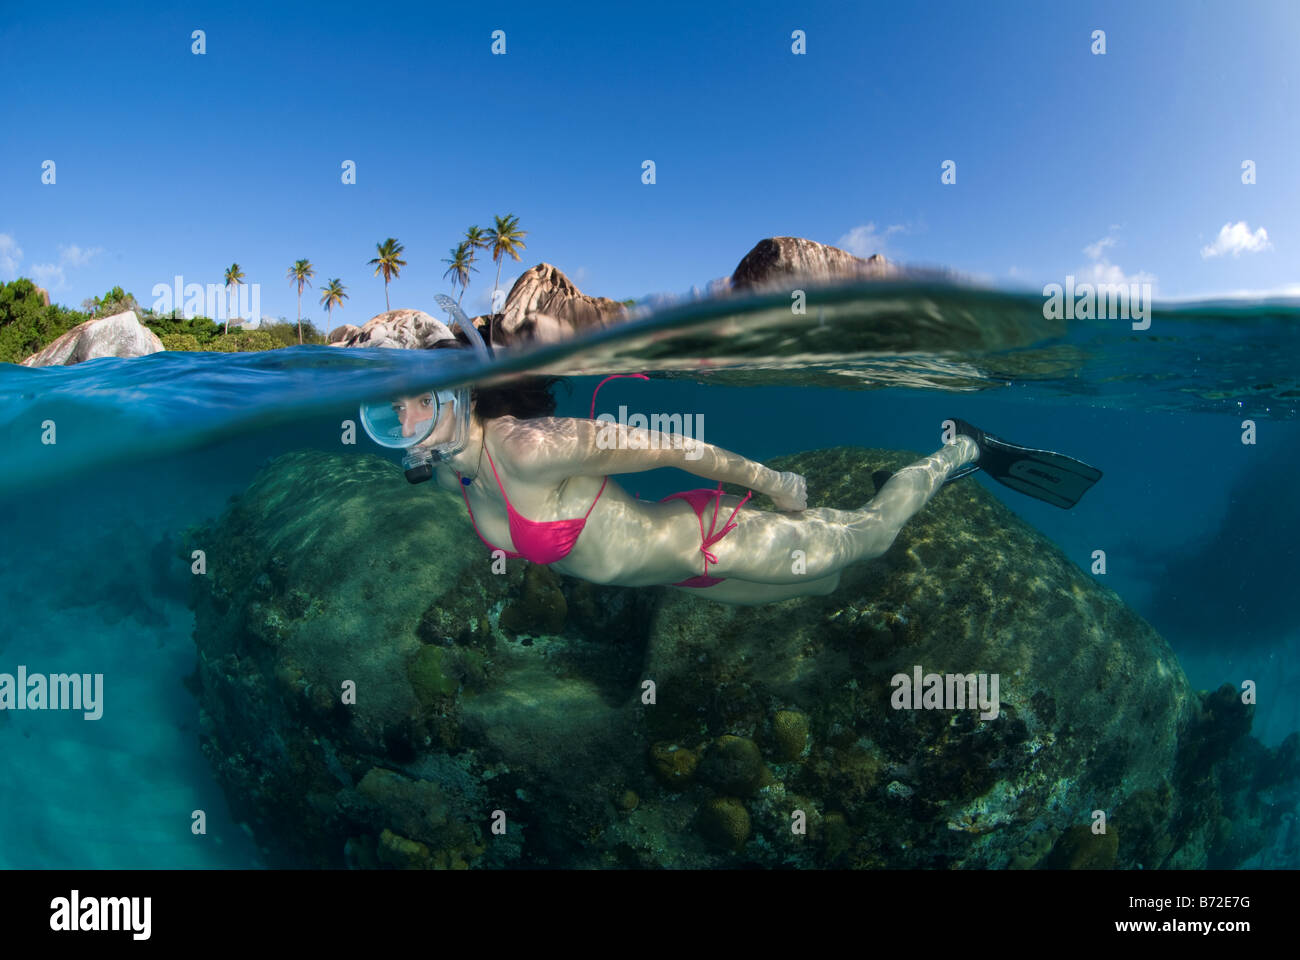 Snorkeling in Baths beach, British Virgin Islands, female diver, oval mask, bikini, blue water, clear water, snorkel, Stock Foto